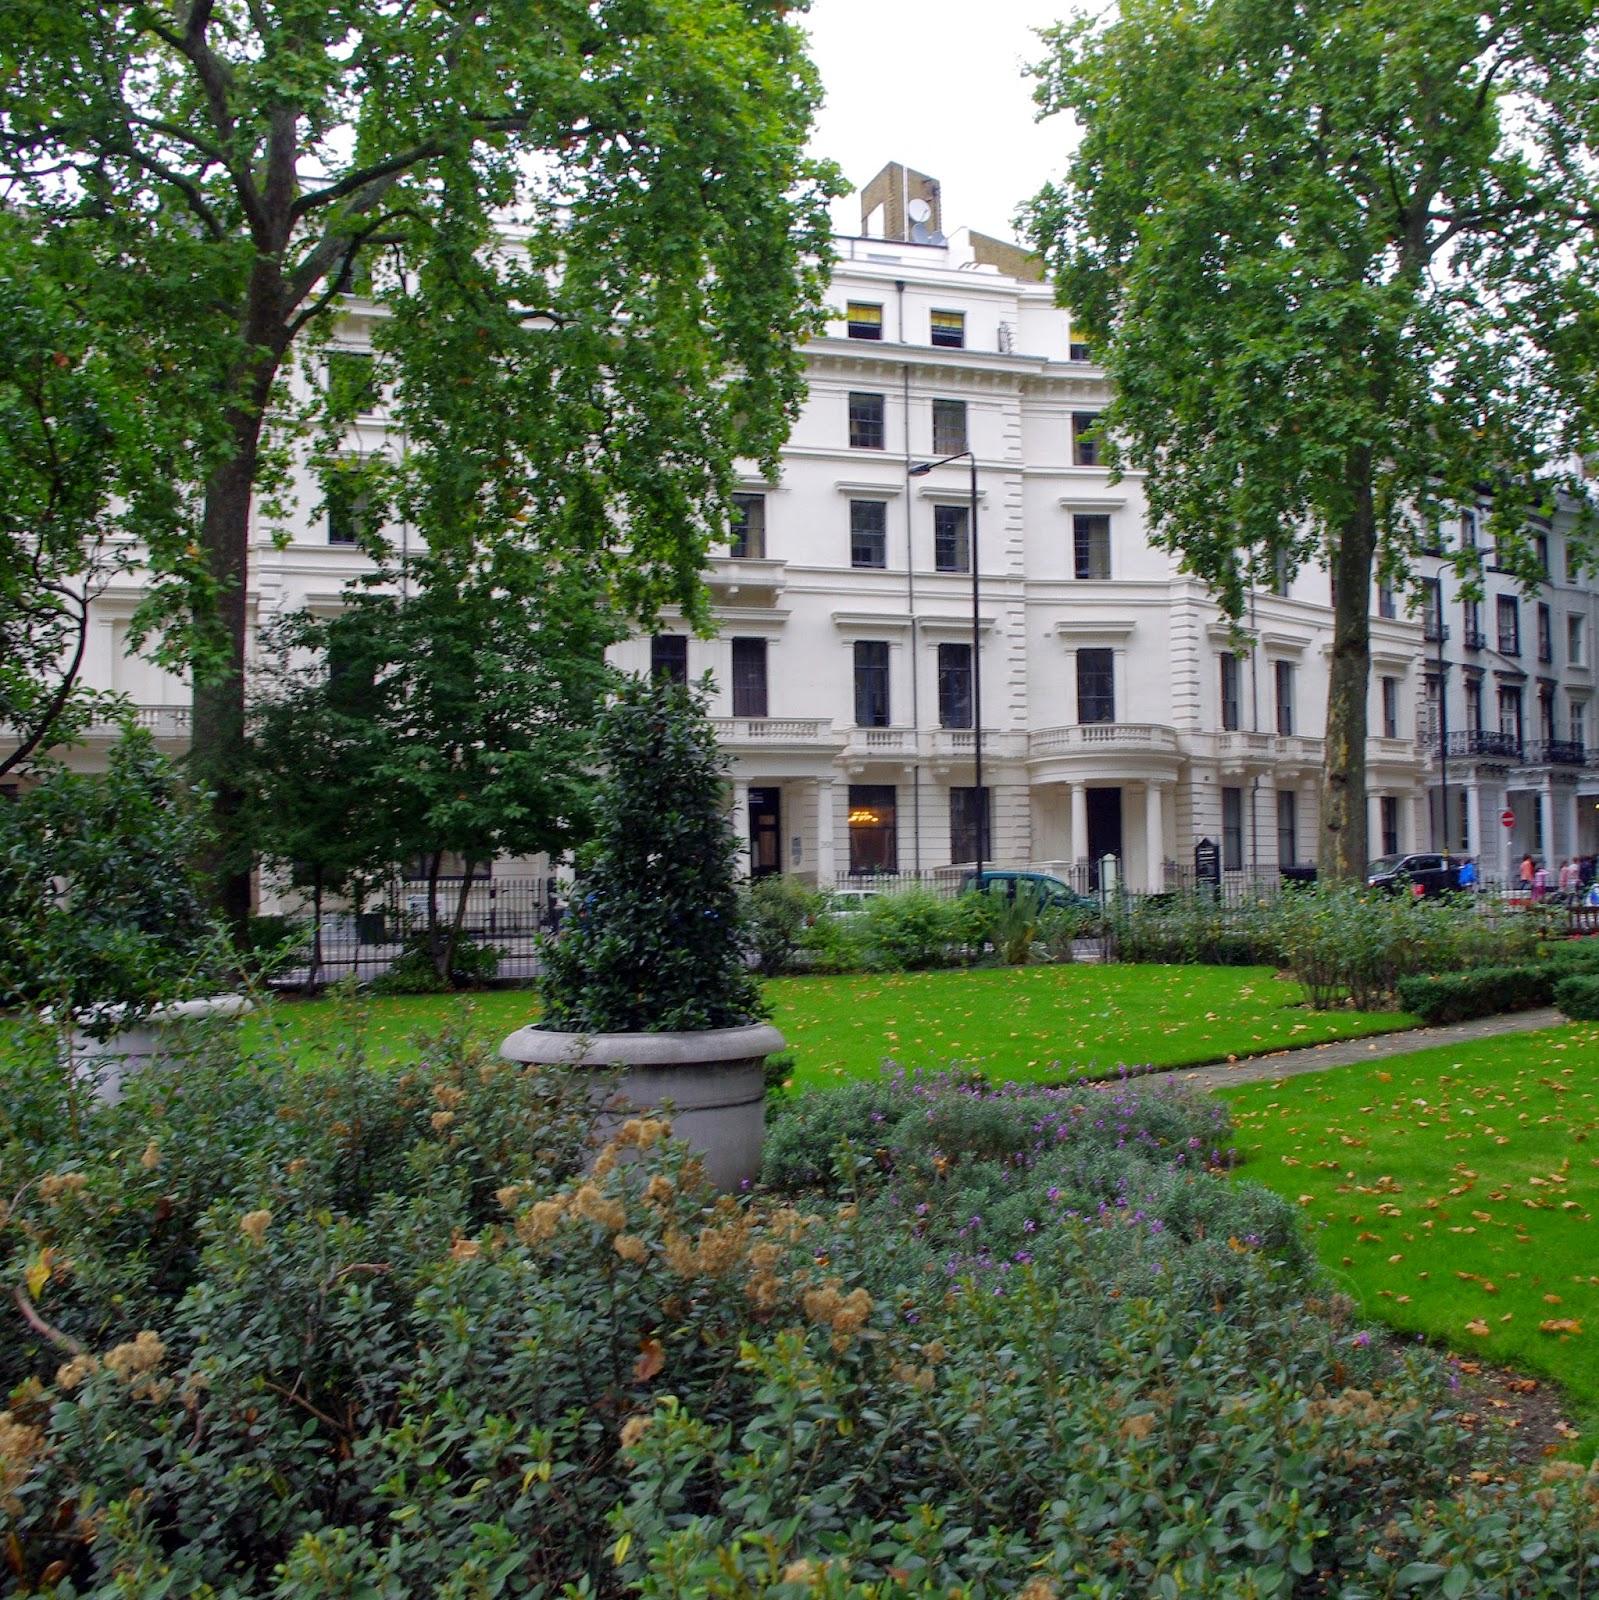 Go Native Luxury Serviced Apartments Hyde Park, London